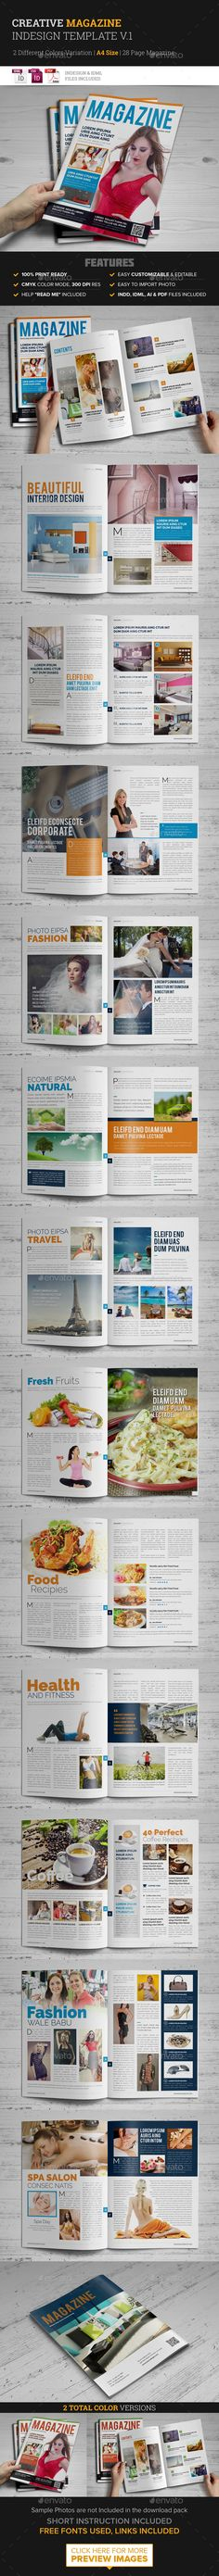 331 best Graphic Design images on Pinterest Print design, Print - resume indesign template